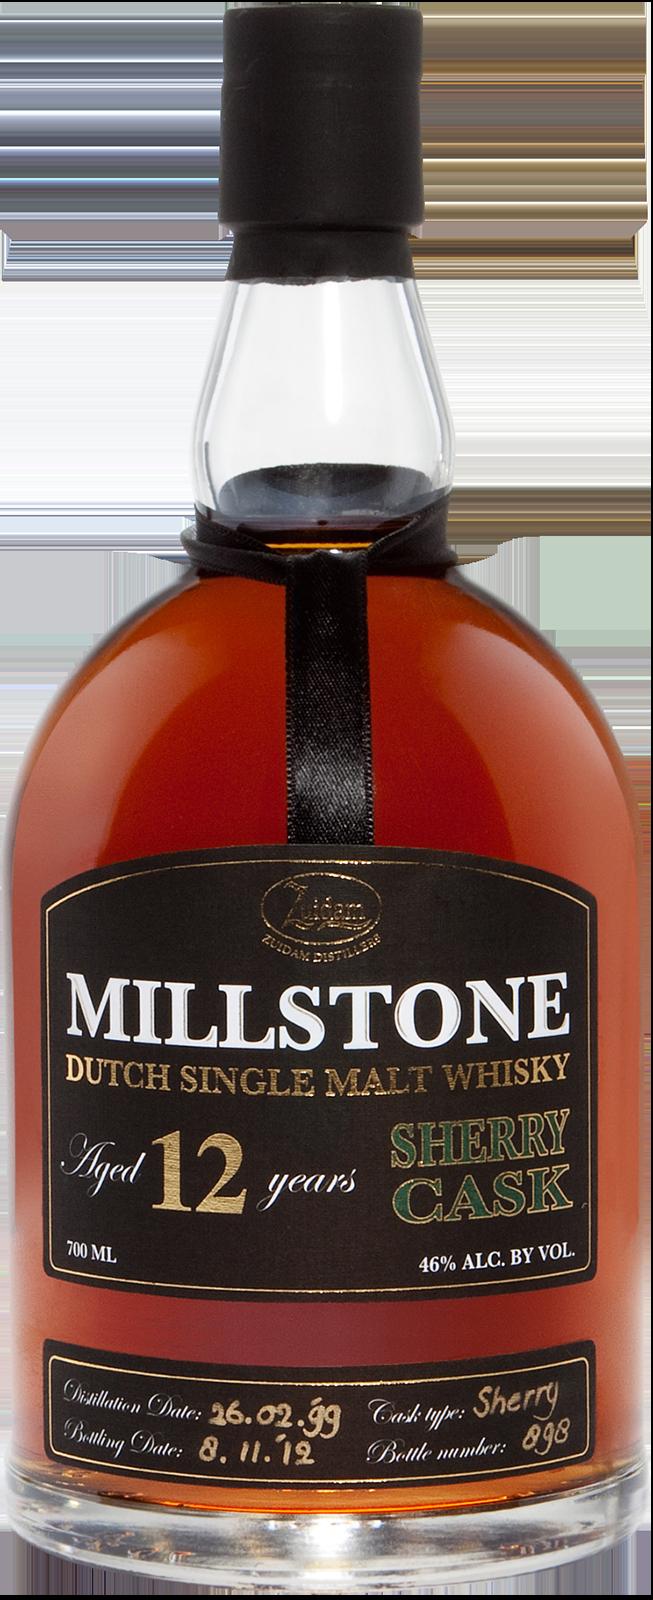 NV-Millstone Dutch Whisky 12 Years Sherry Cask